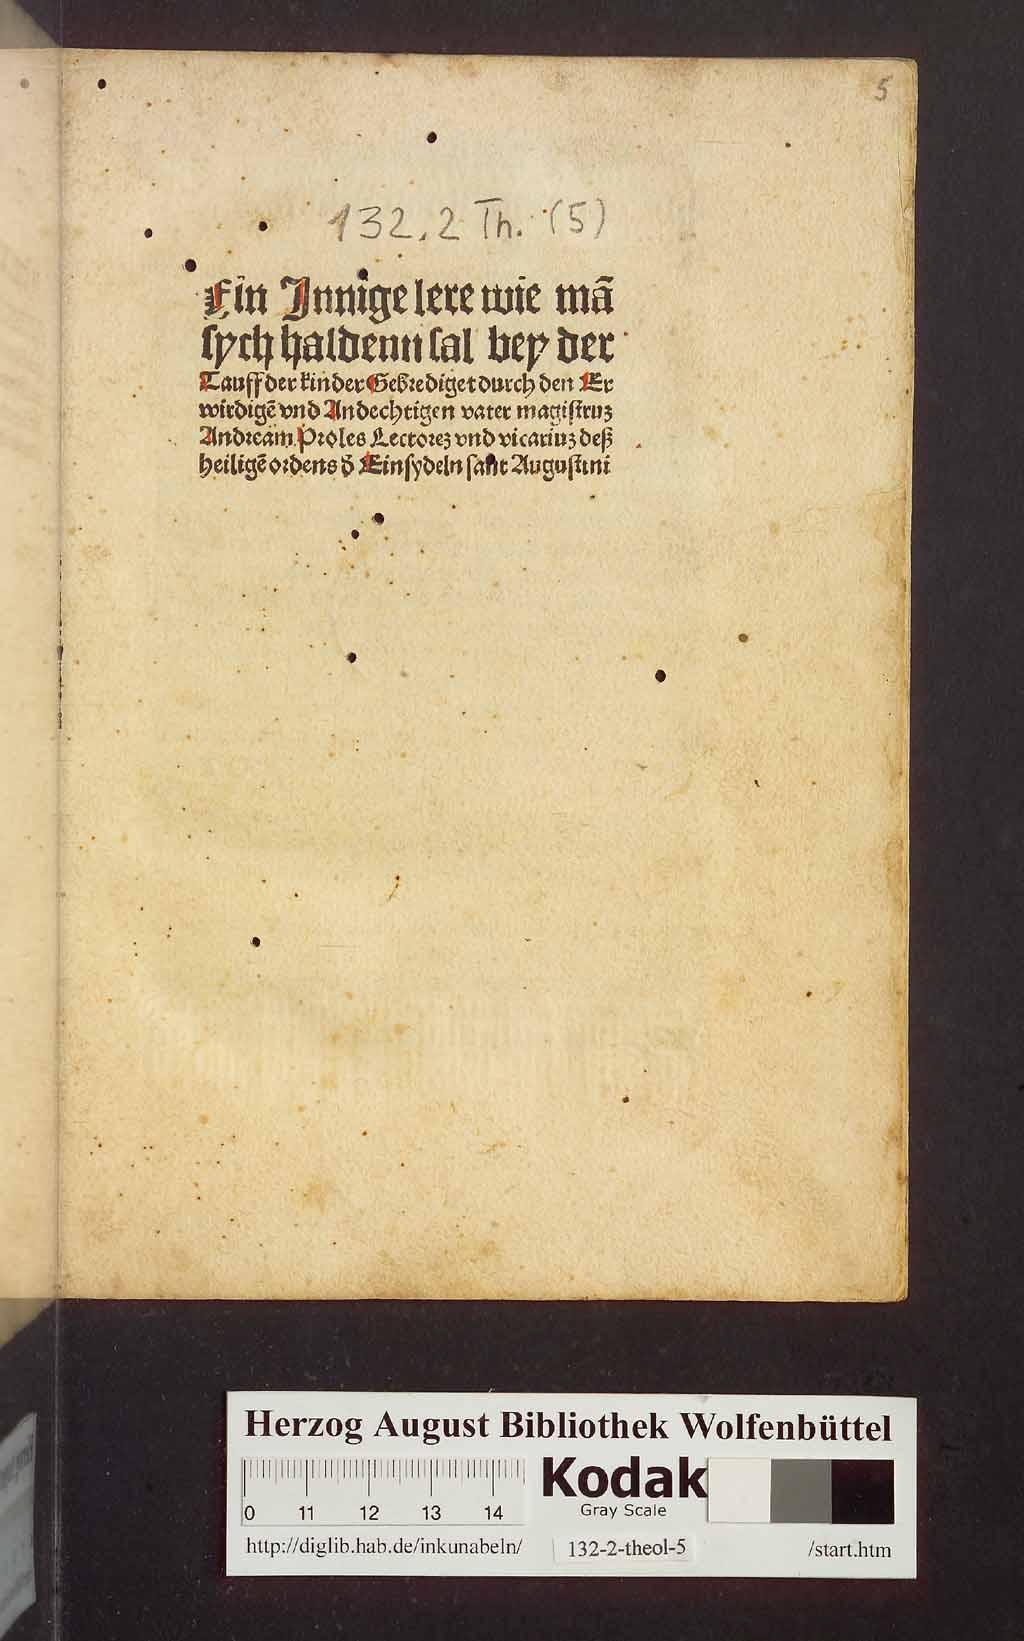 http://diglib.hab.de/inkunabeln/132-2-theol-5/00001.jpg